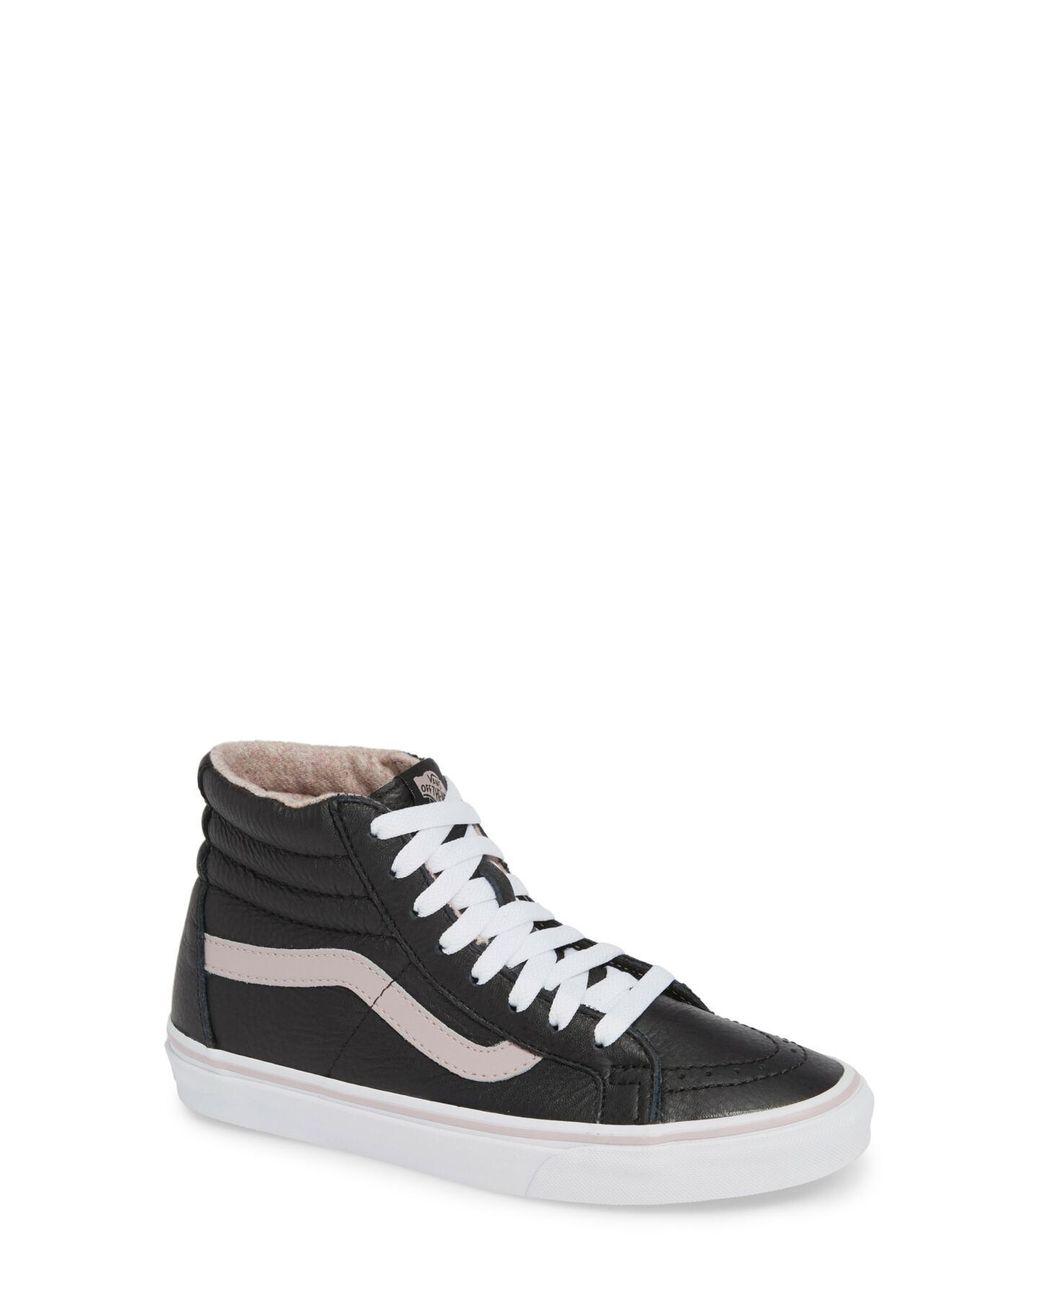 e30b92e7d0 Long-Touch to Zoom. Vans - Multicolor Sk8-hi Reissue Sneaker ...